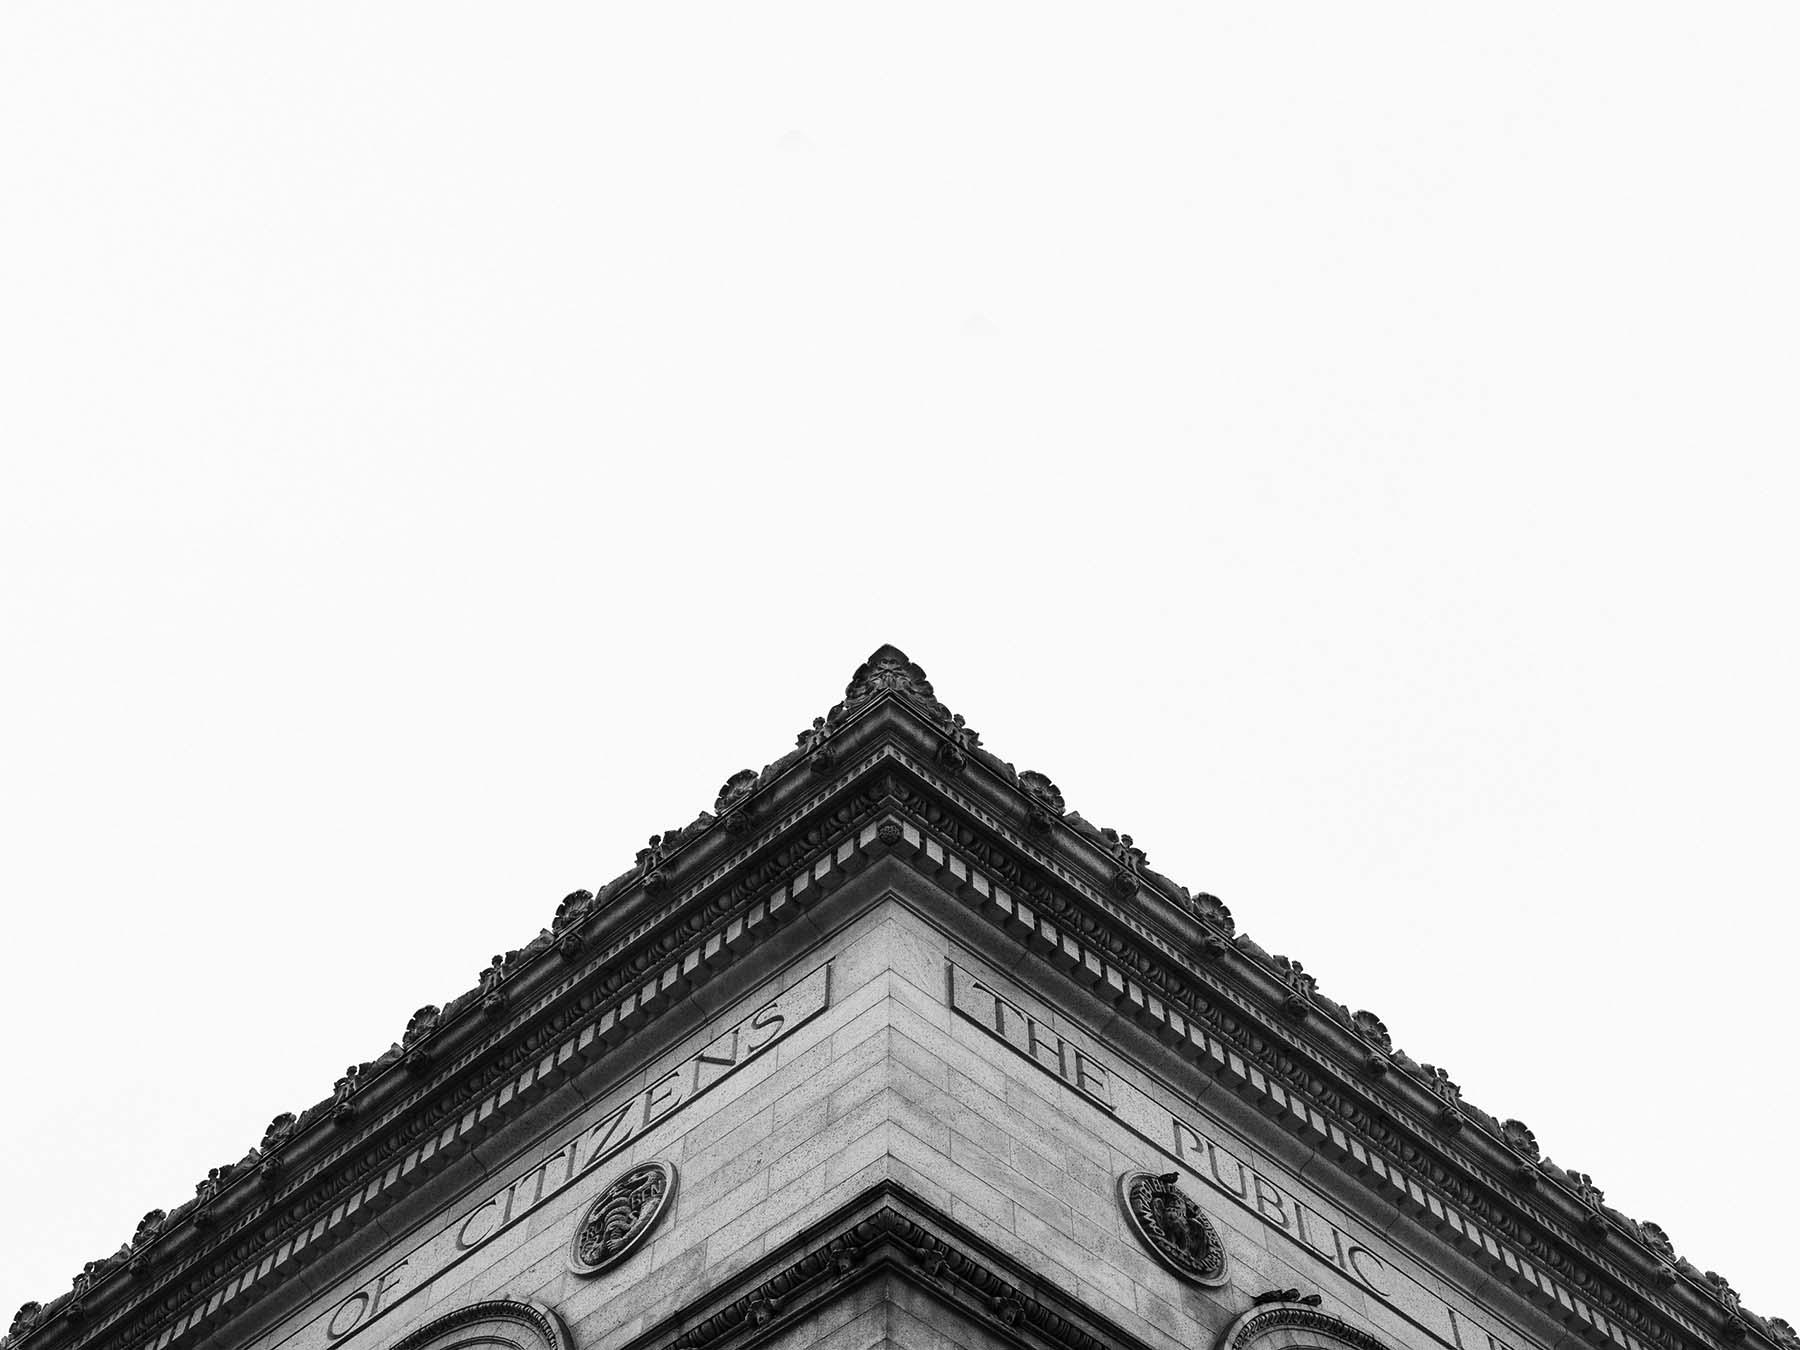 Boston Public Library, Boston USA